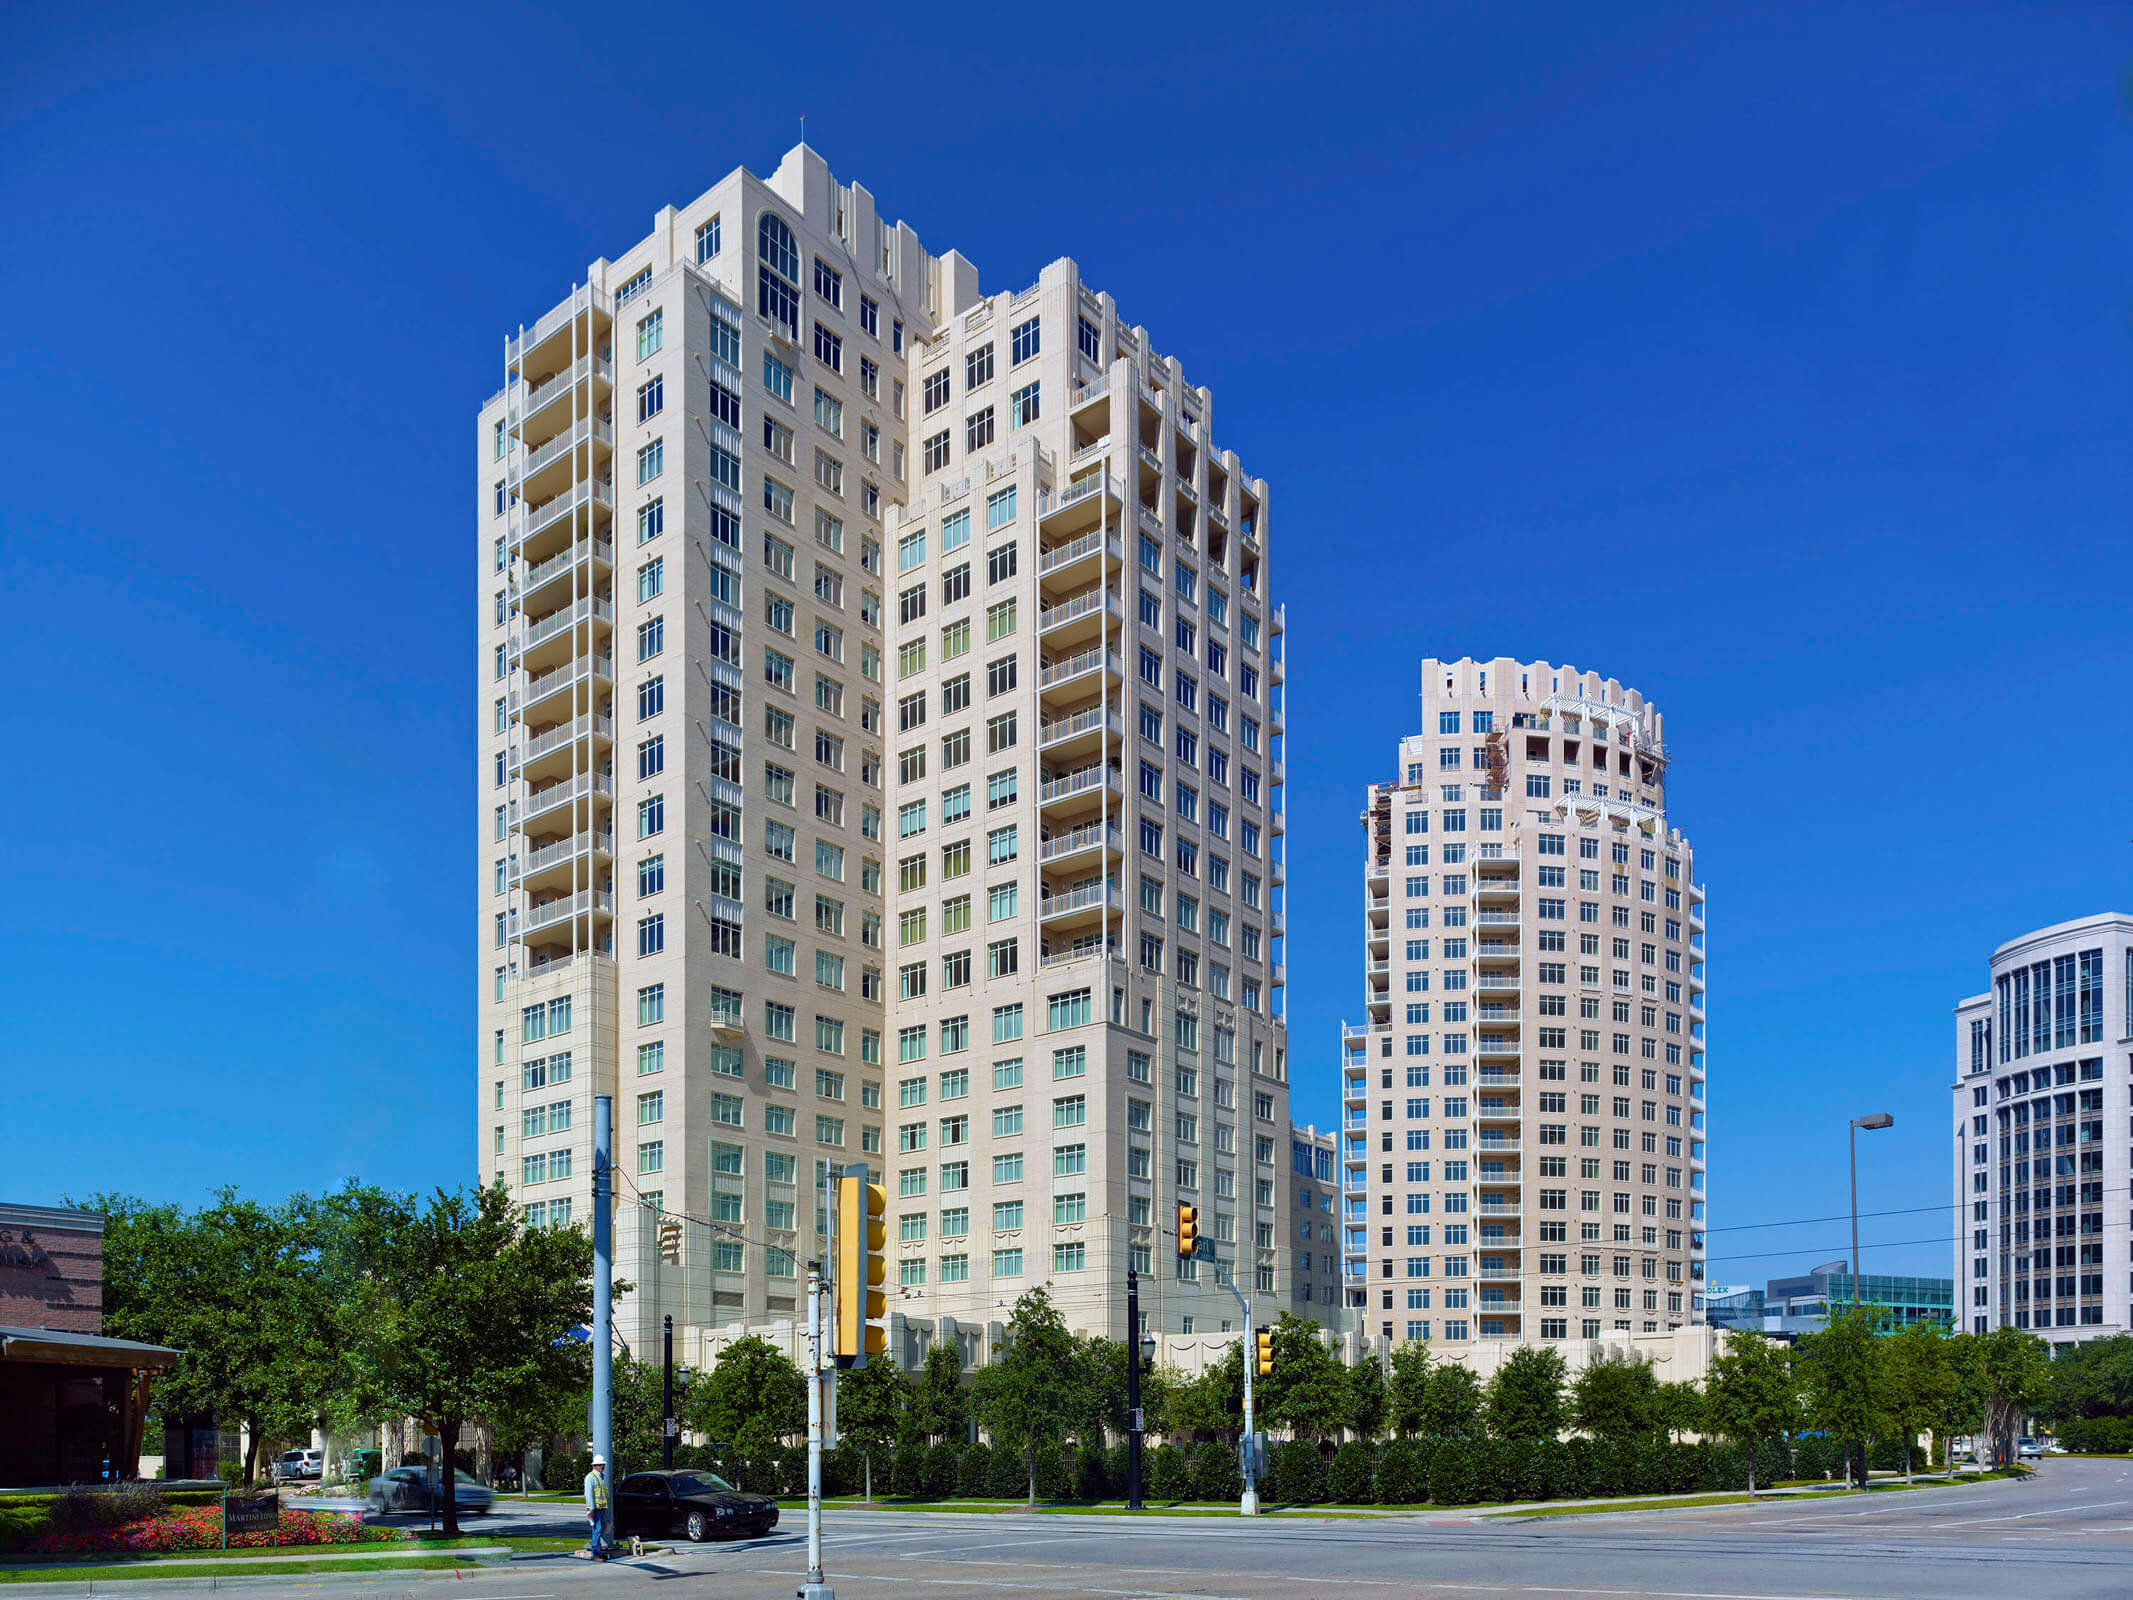 The Ritz Carlton: Luxury Hotels in Dallas